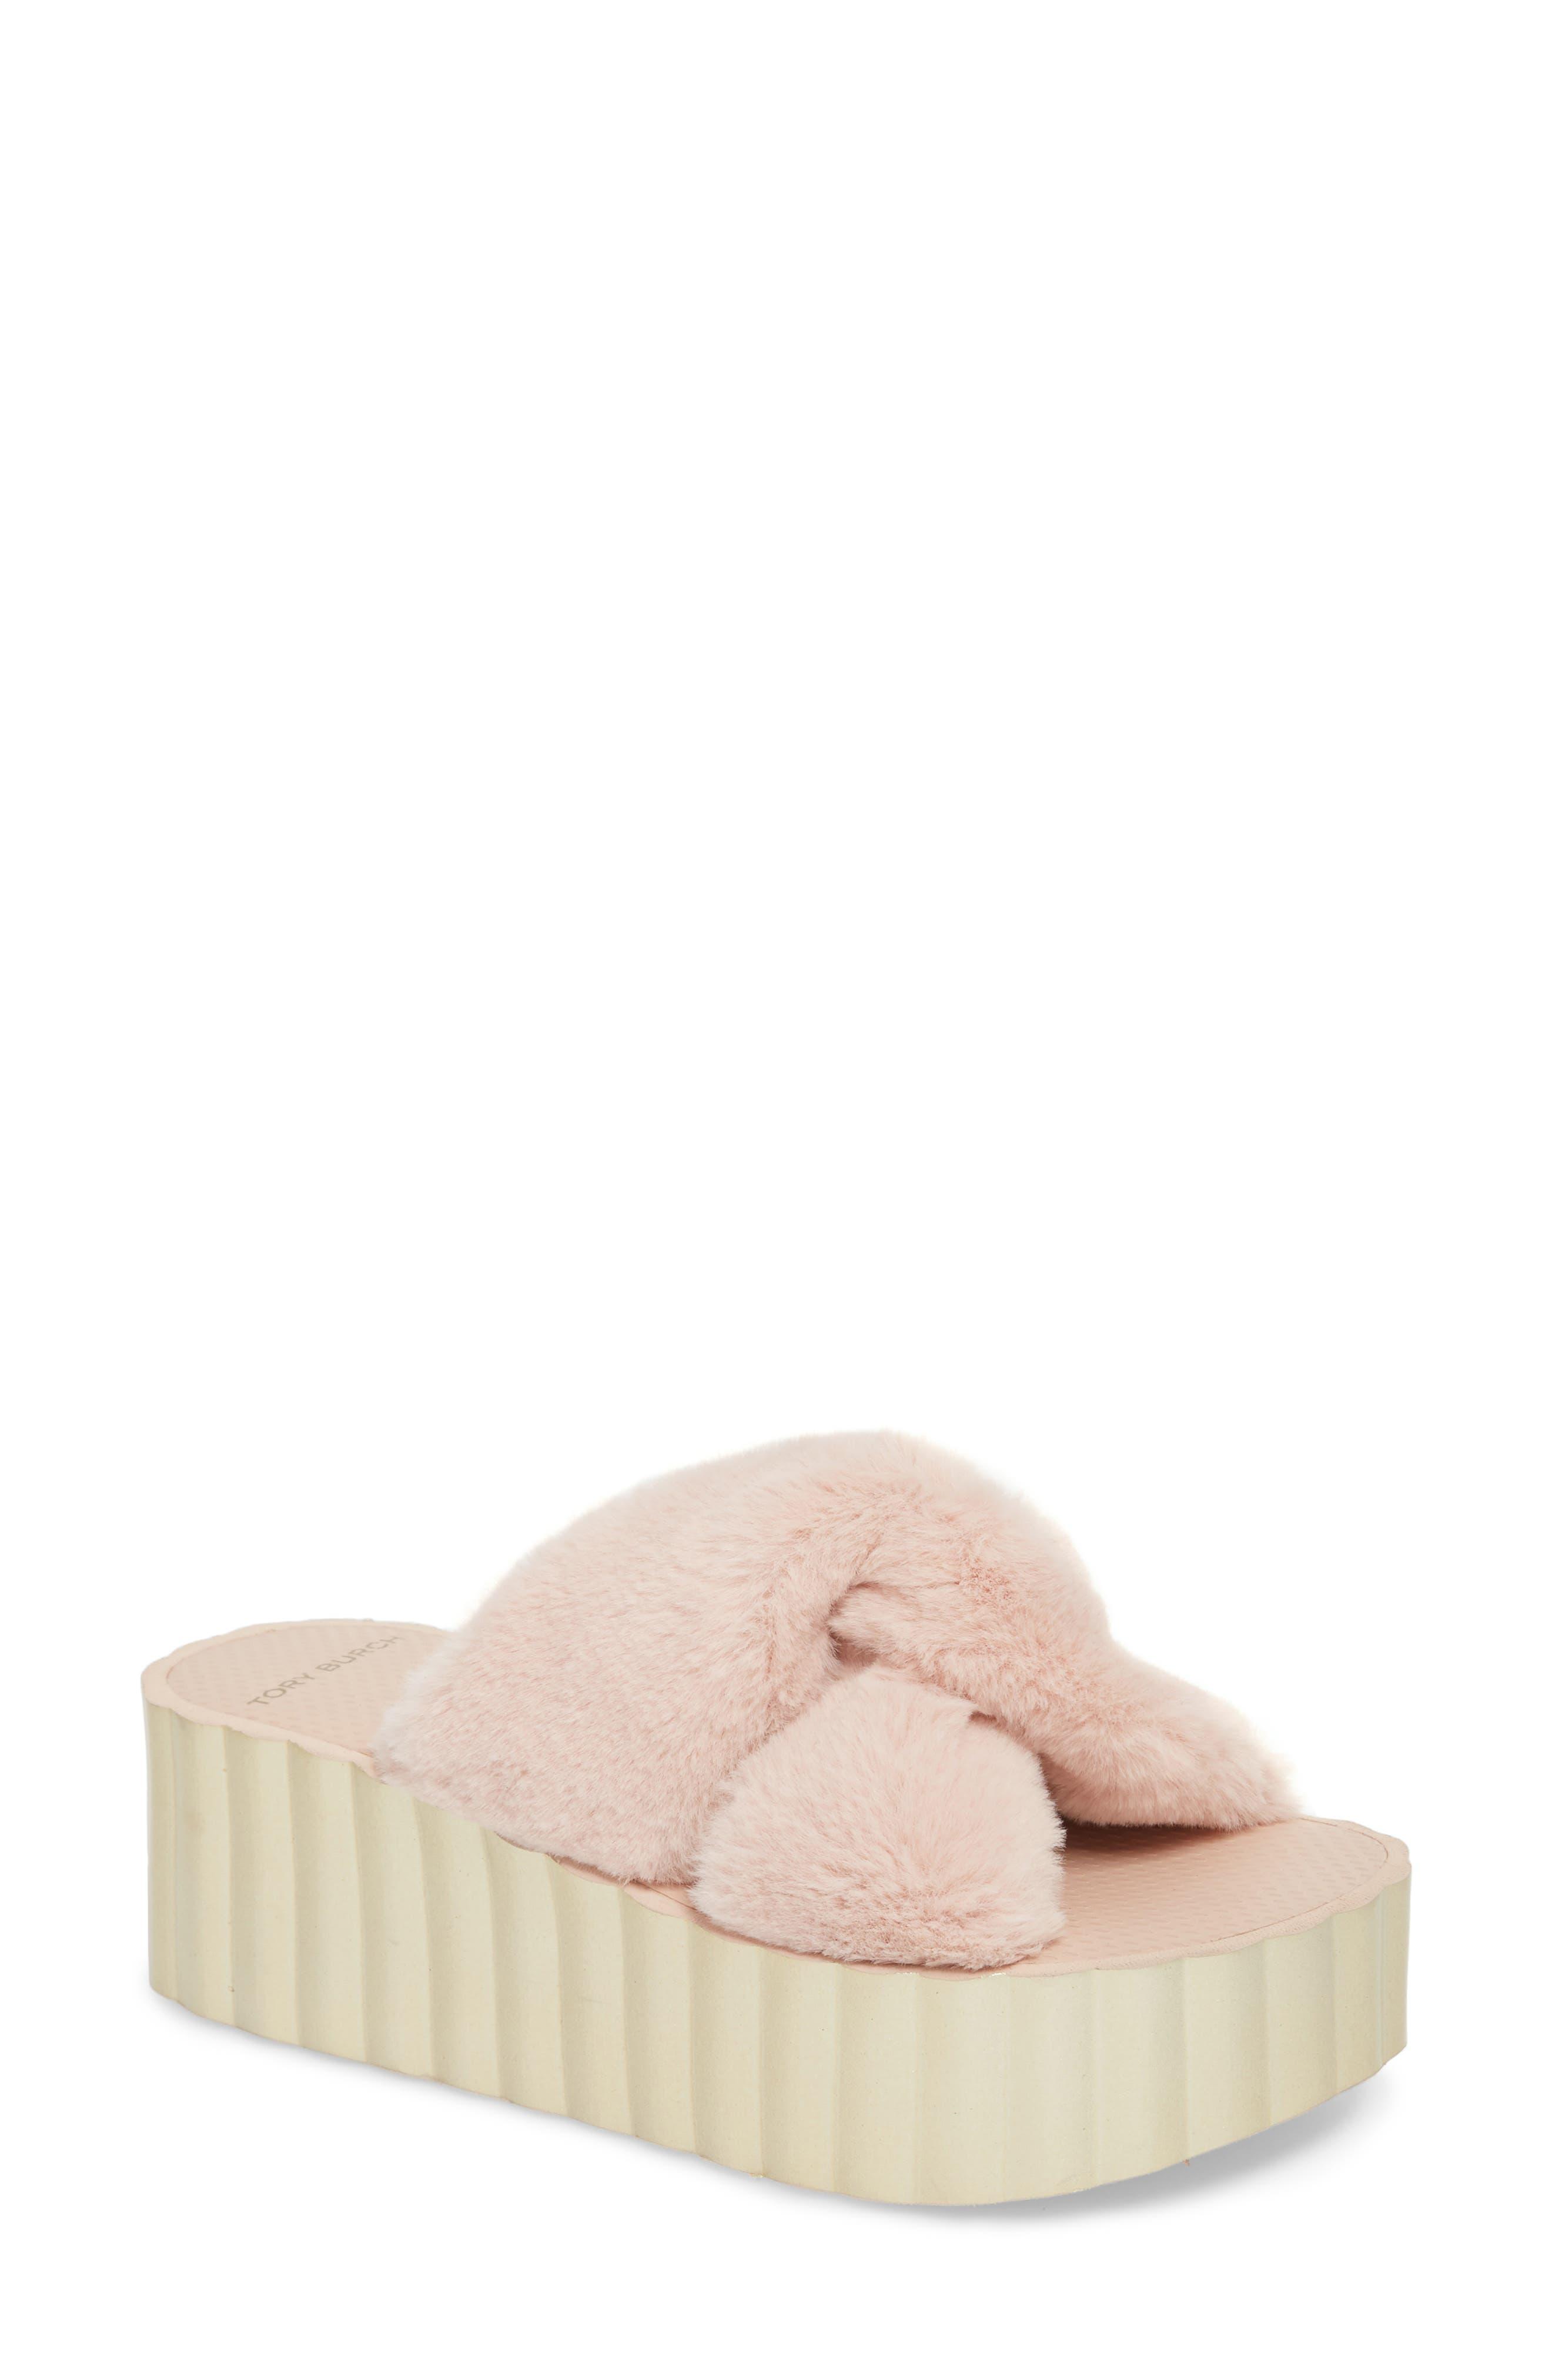 Faux Fur Scallop Platform Slide Sandal,                             Main thumbnail 1, color,                             Sea Shell Pink